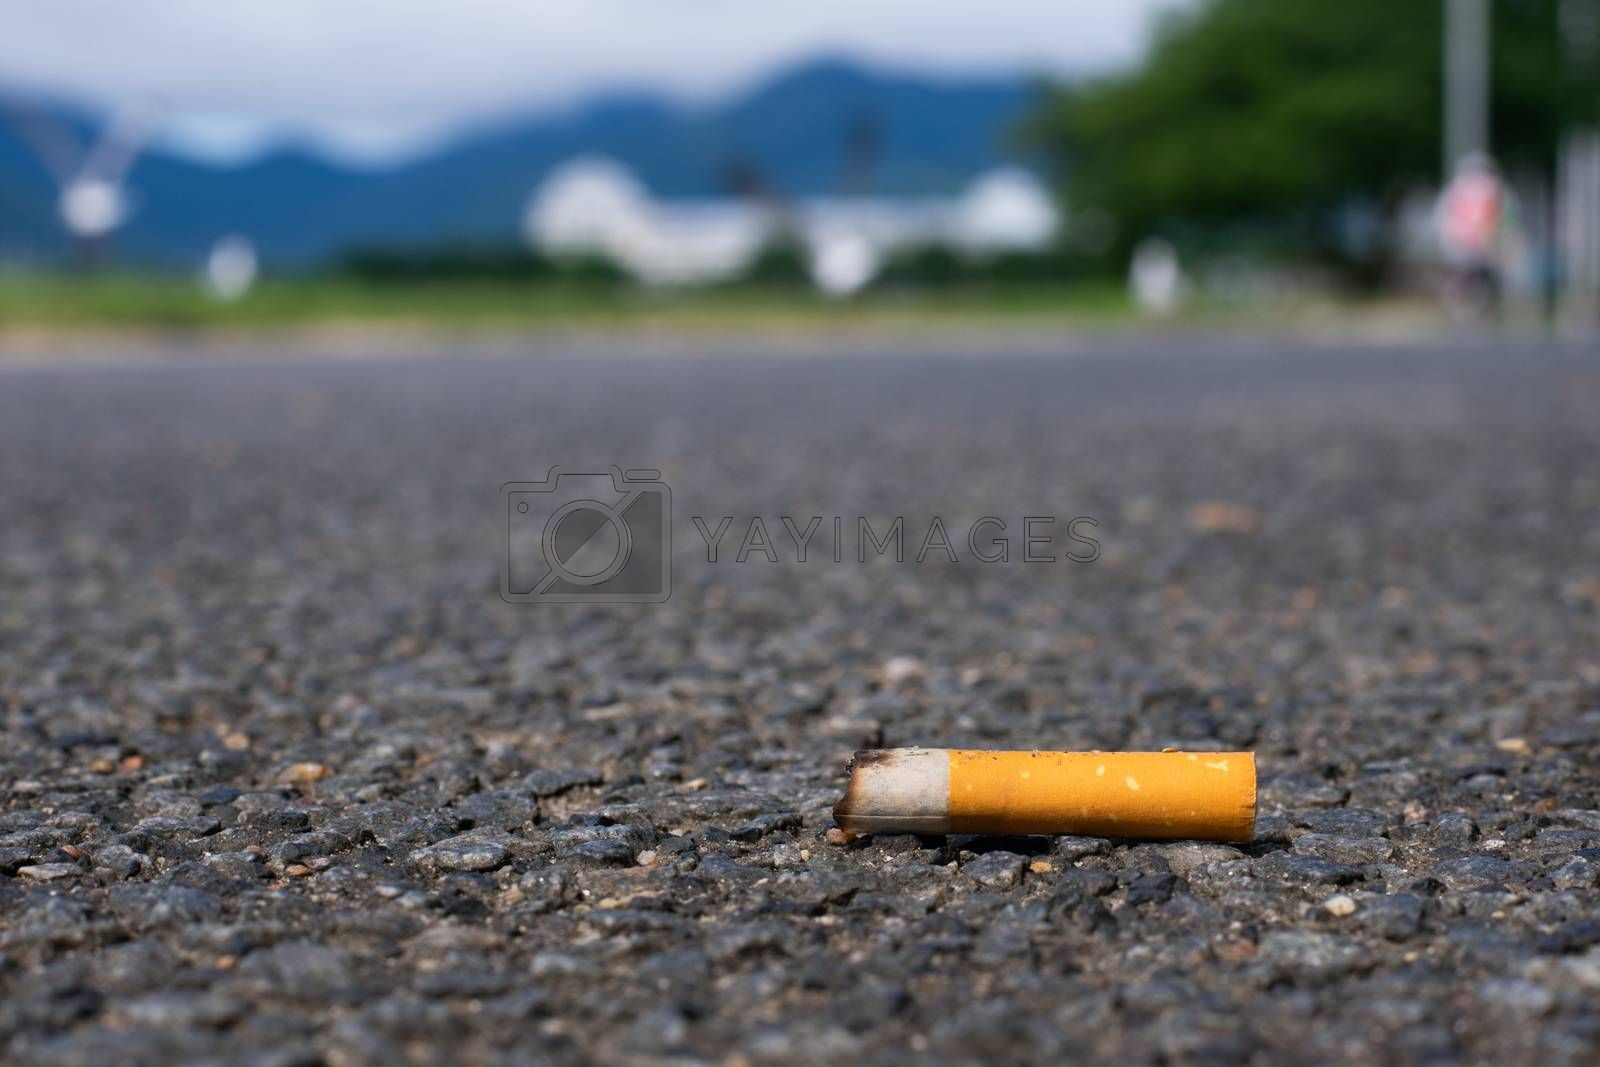 Cigarette littered on sidewalk